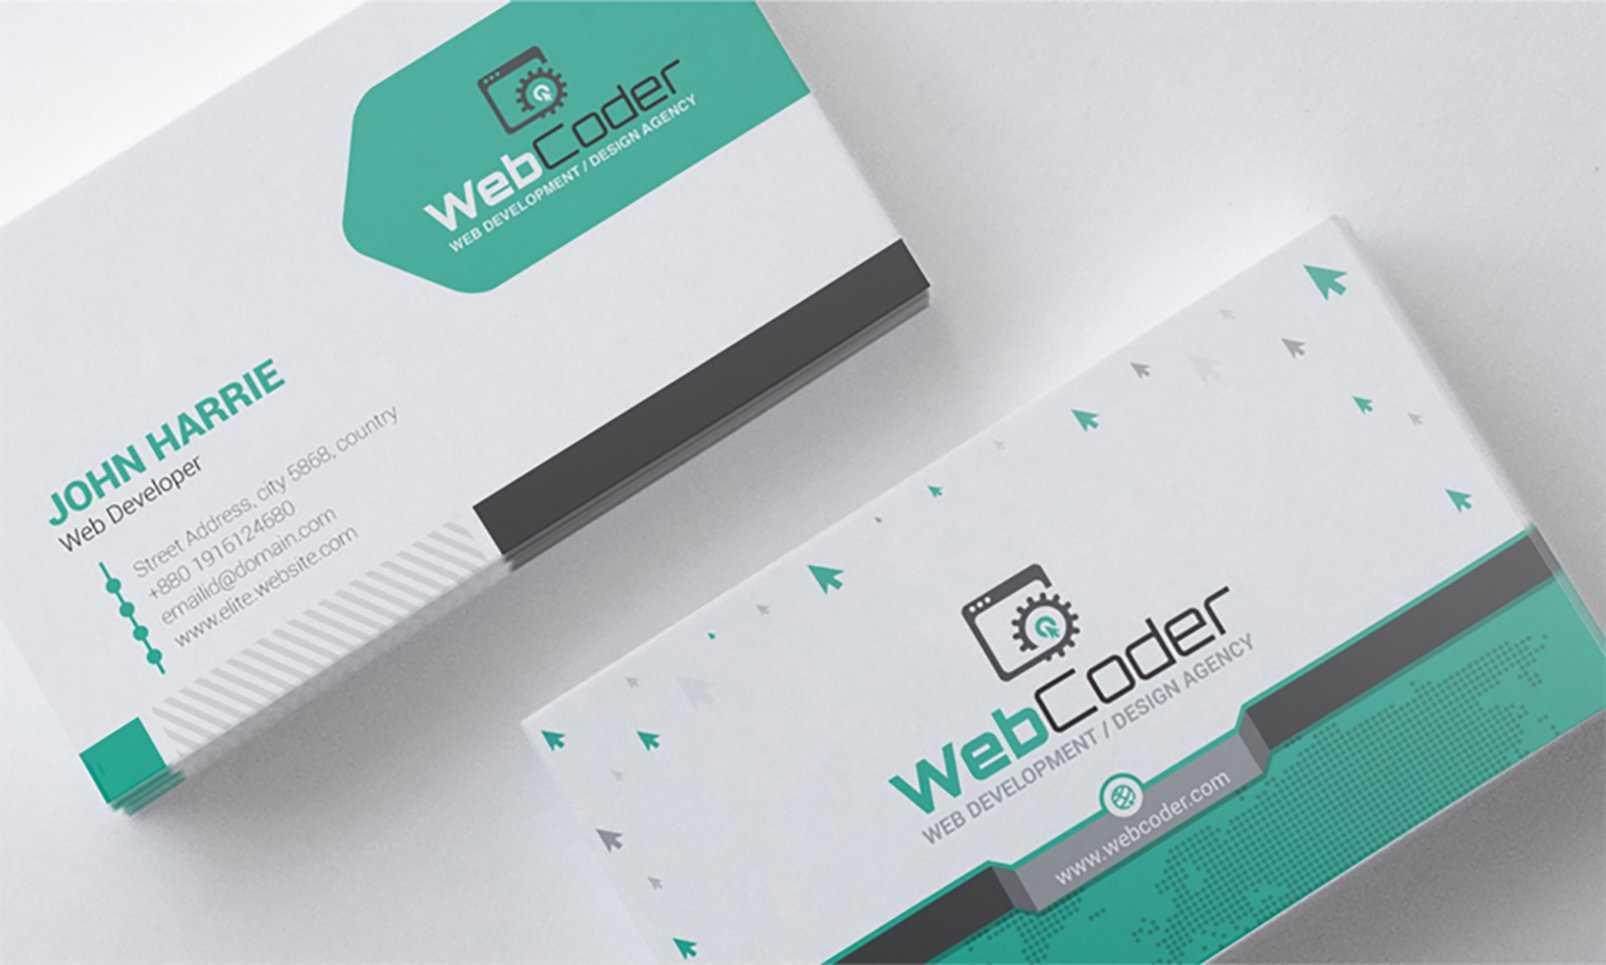 'business Card Design For Web Design And Developer' - Адаптивний Psd Шаблон  №66306 In Web Design Business Cards Templates